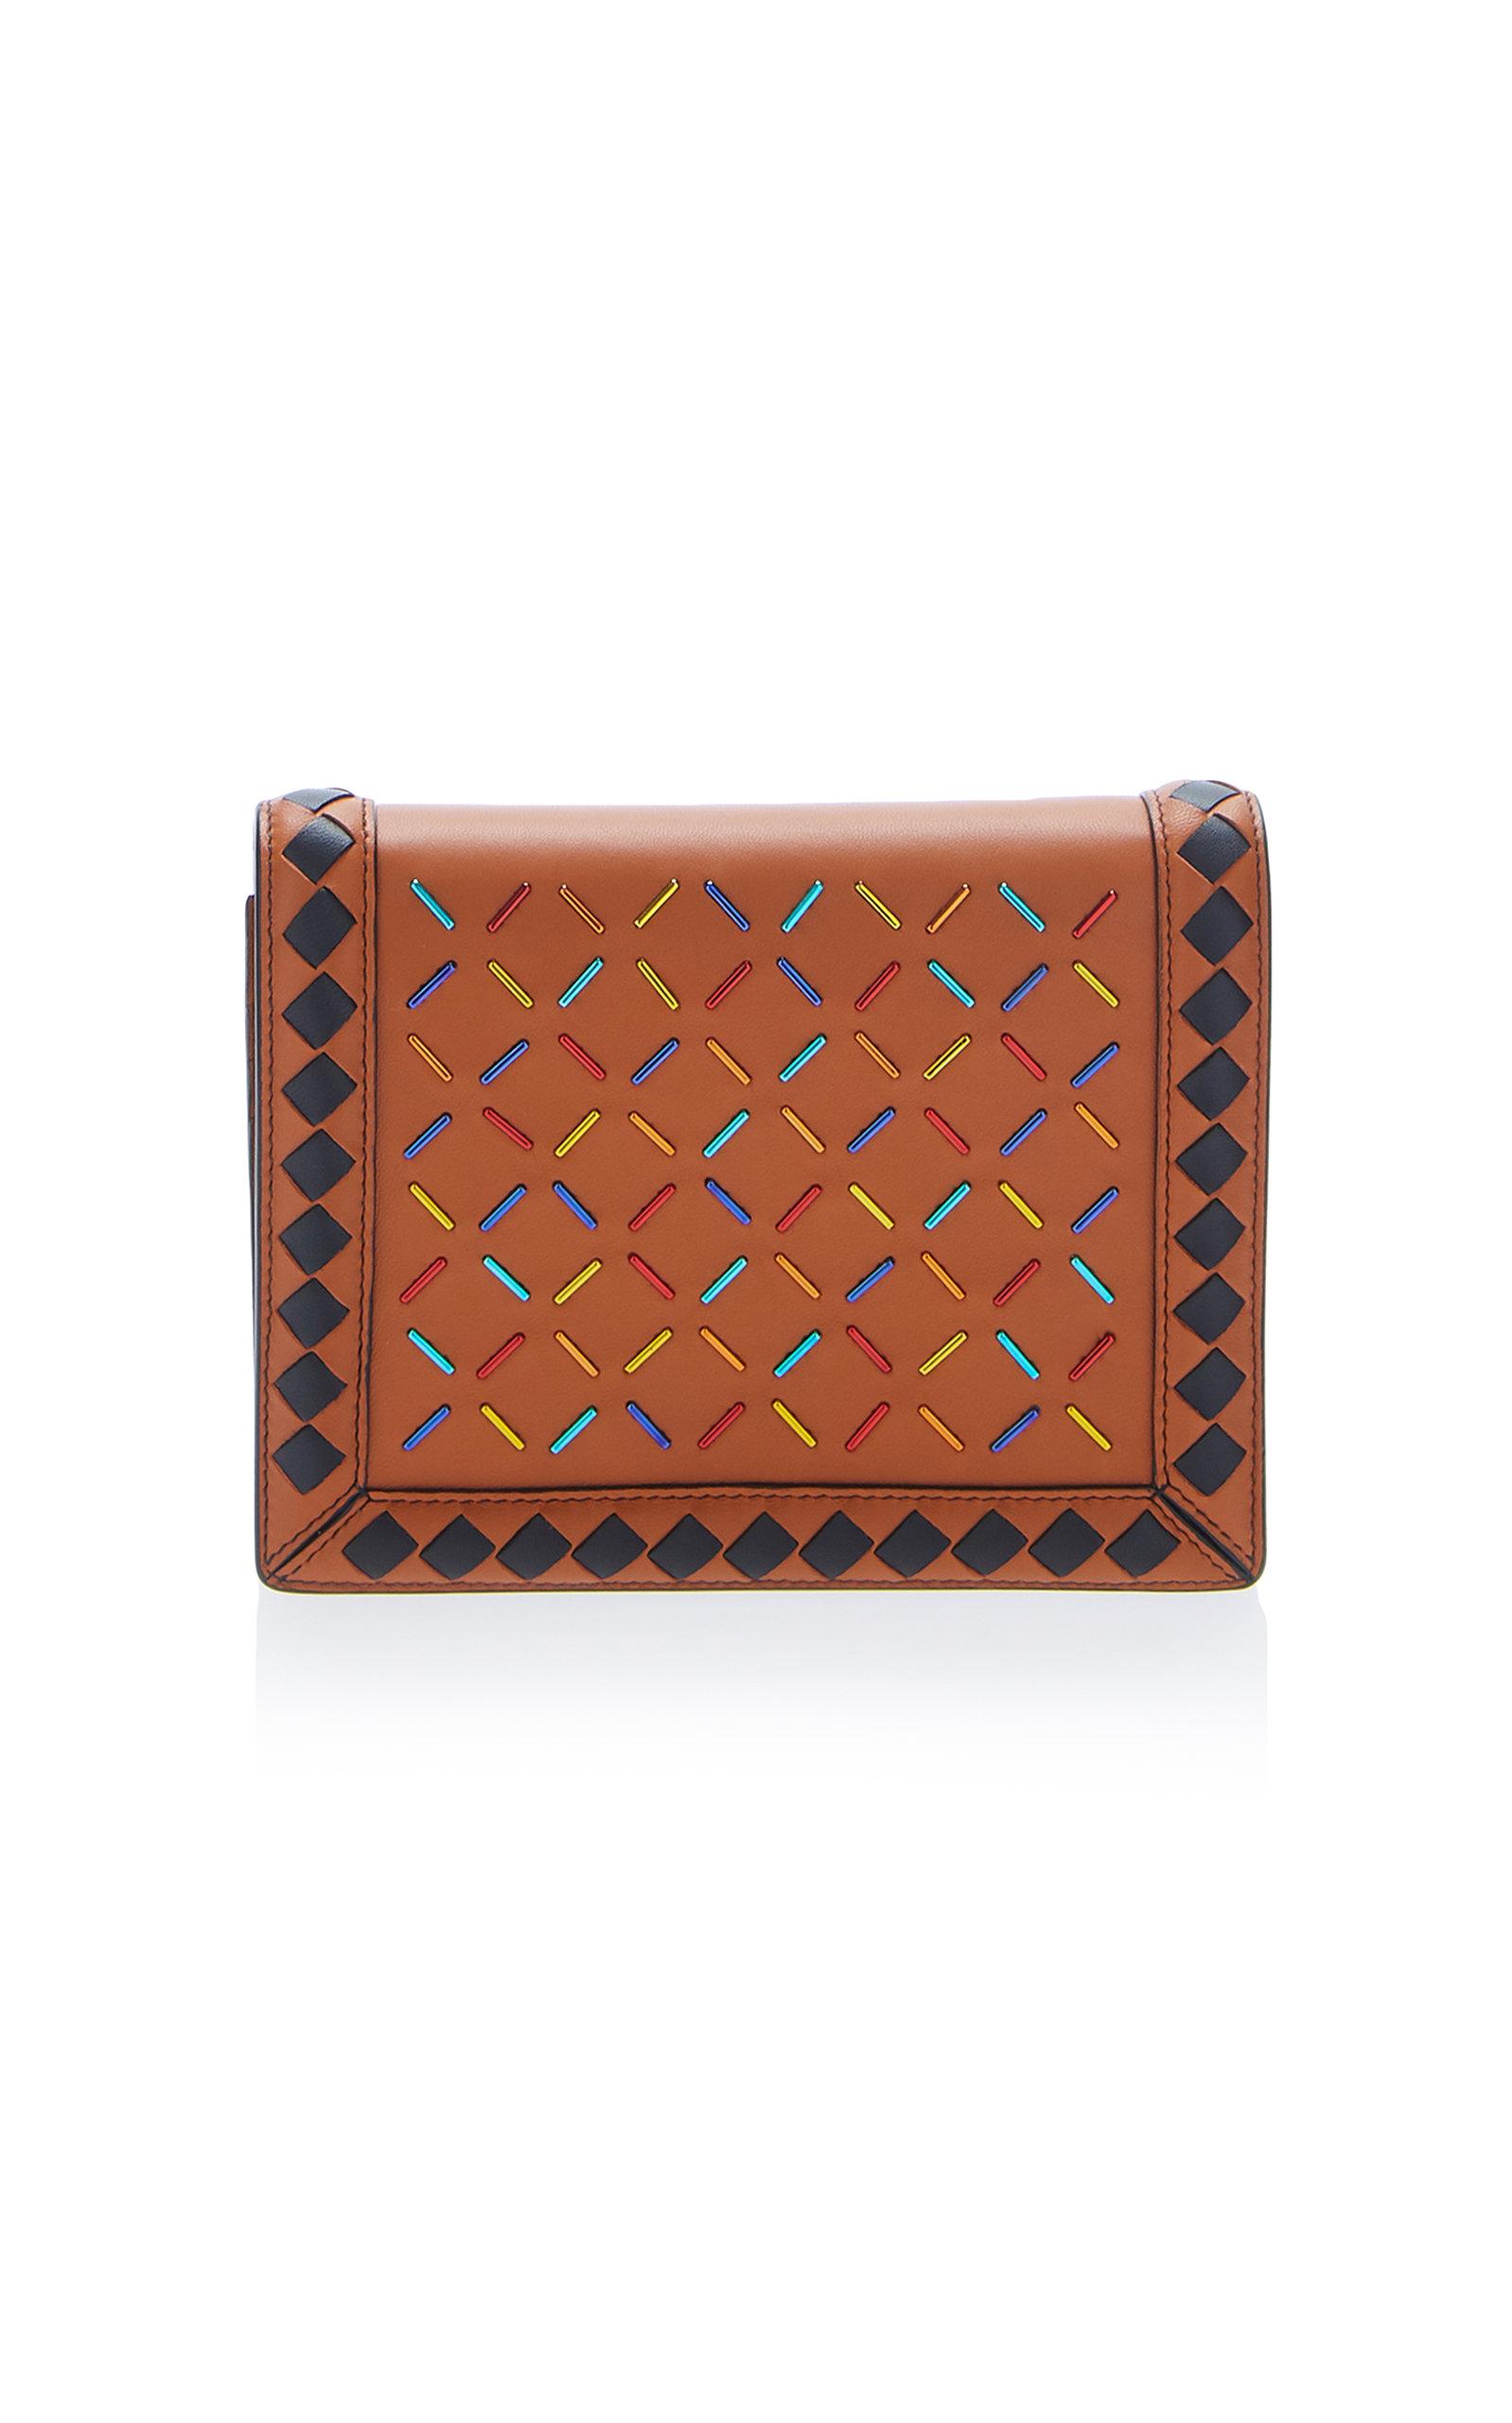 Chain Leather Wallet Bottega Veneta 5CjyIN